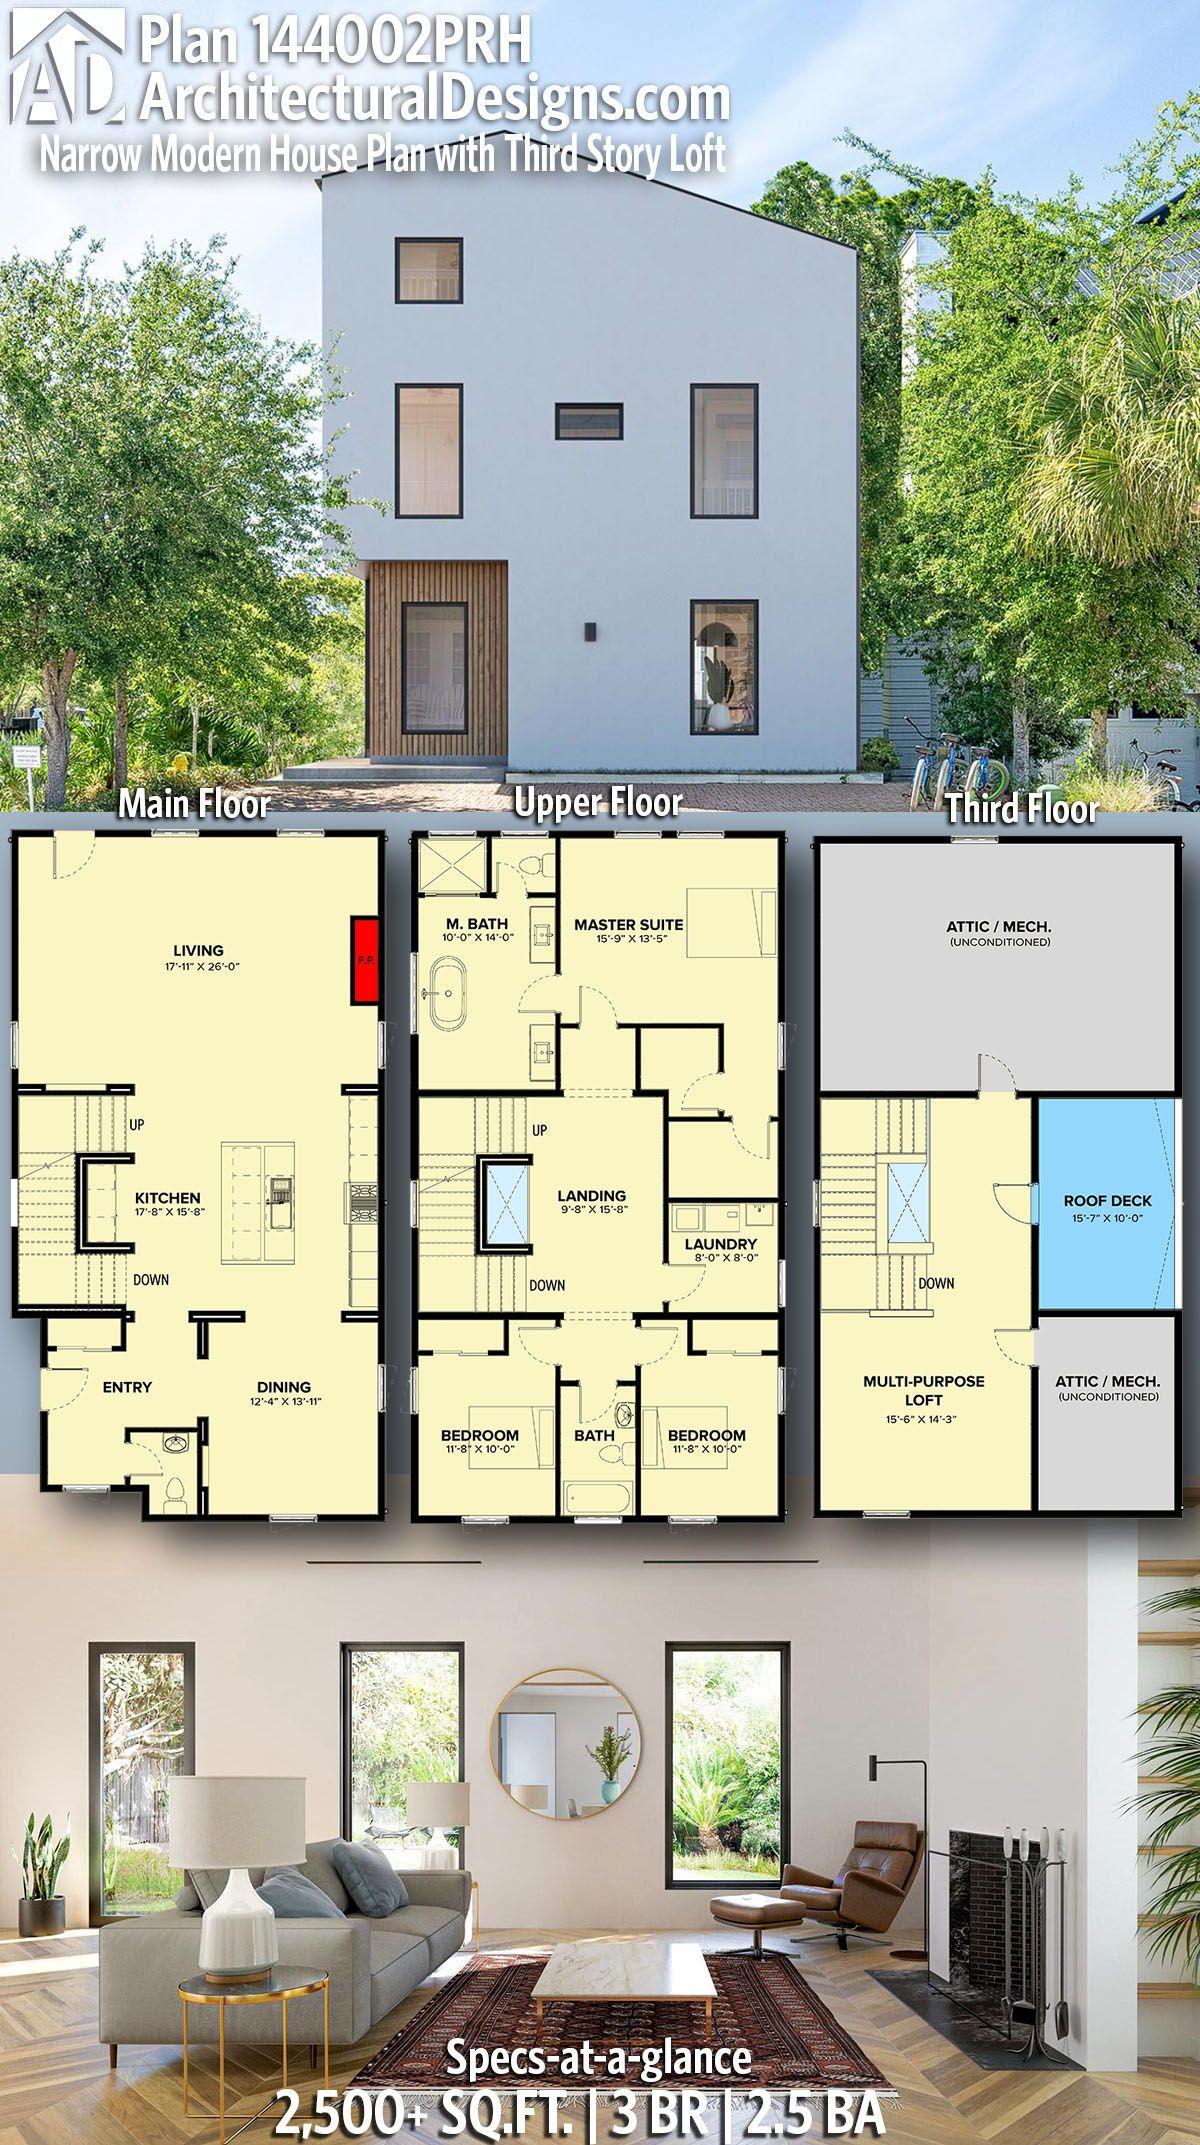 Plan 144002prh Narrow Modern House Plan With Third Story Loft In 2020 Modern House Plans House Layouts Dream House Plans